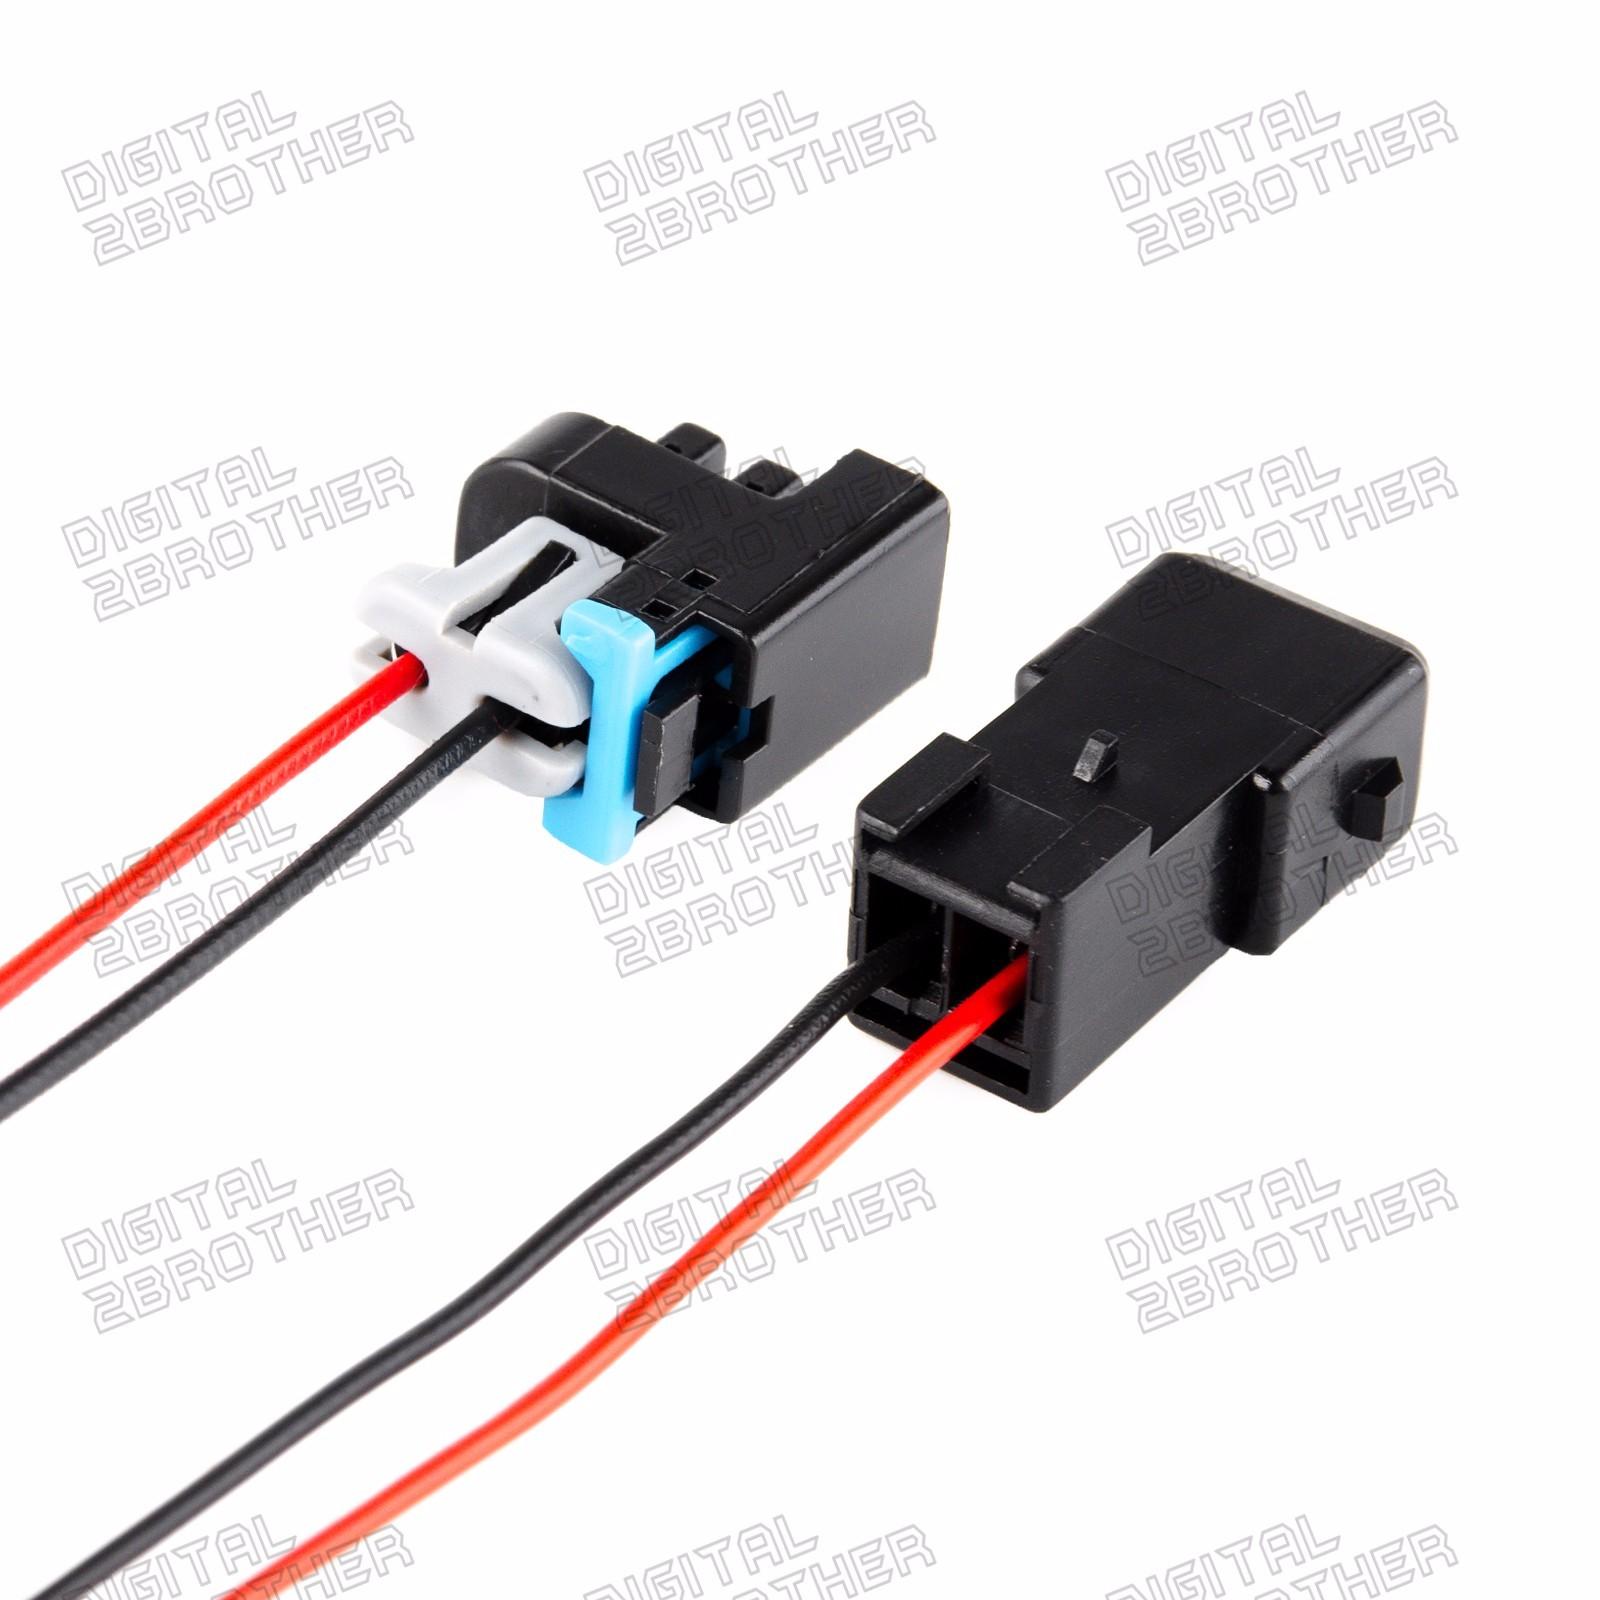 hight resolution of lq4 lq9 4 8 5 3 6 0 fits delphi wire harness to ls1 ls6 lt1 ev1 injector adapter